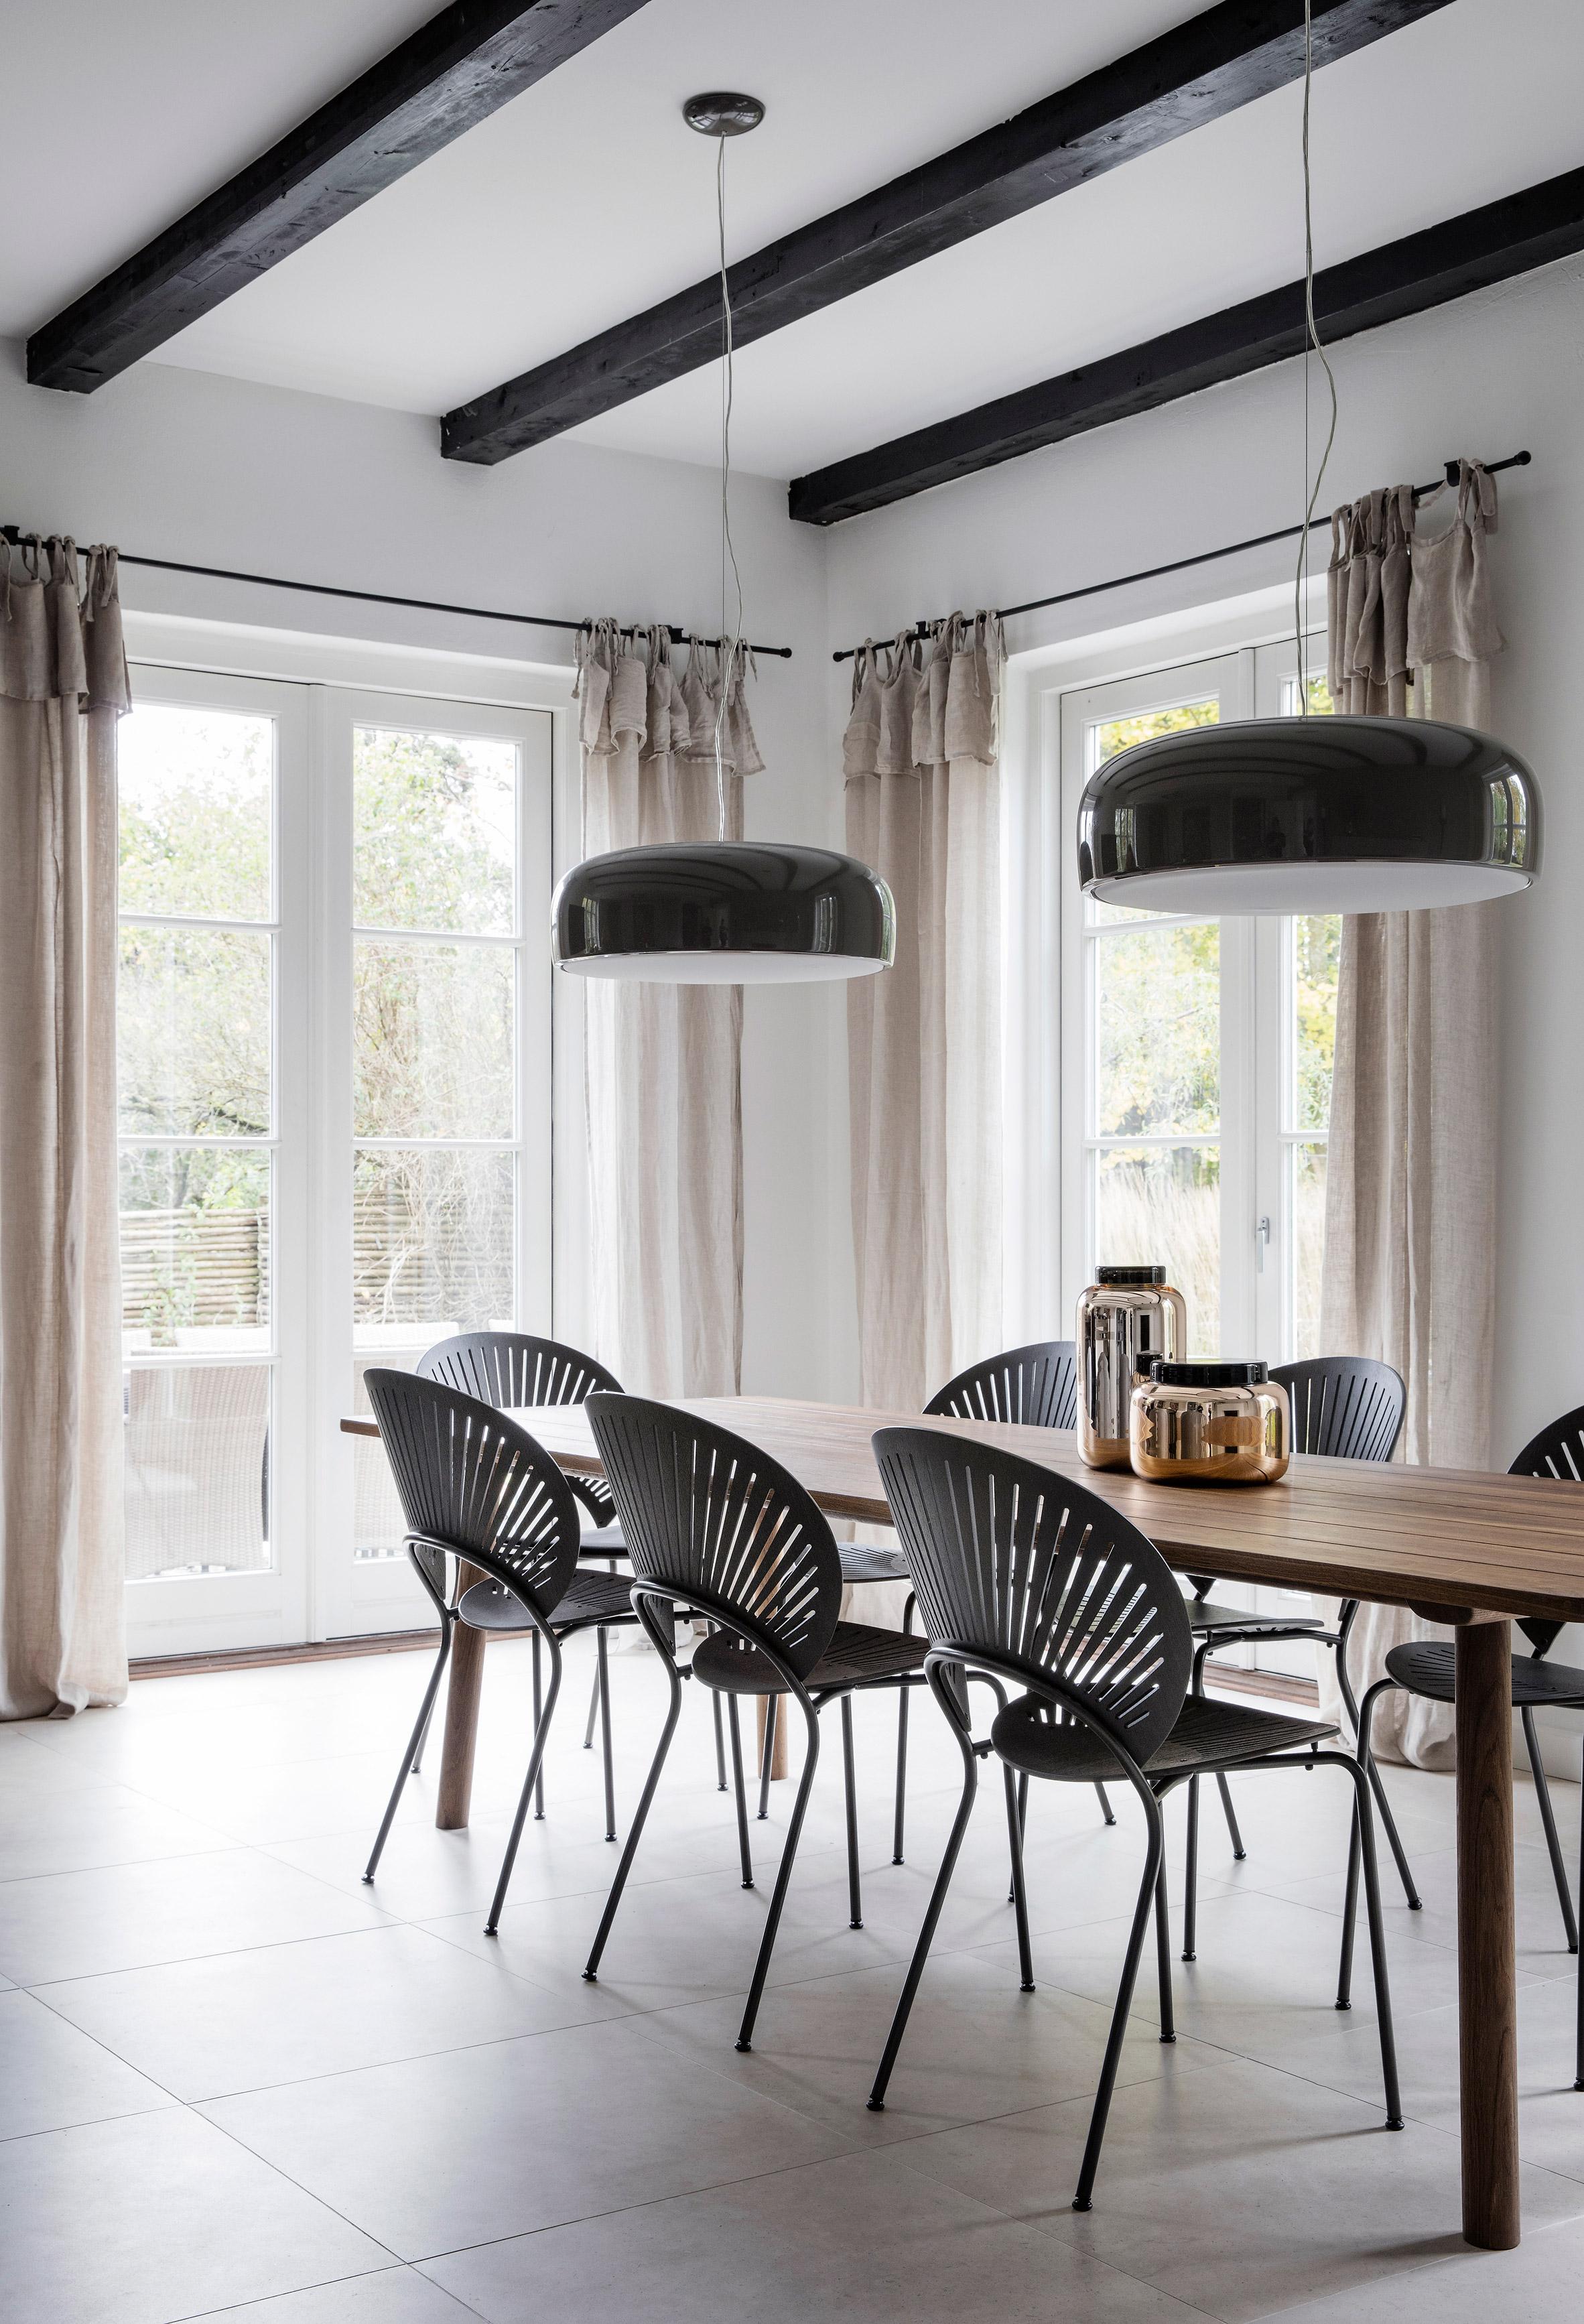 elledecoration vn nhà màu trung tính kaja-moller-home-fredericia-interiors-residential-copenhagen 2